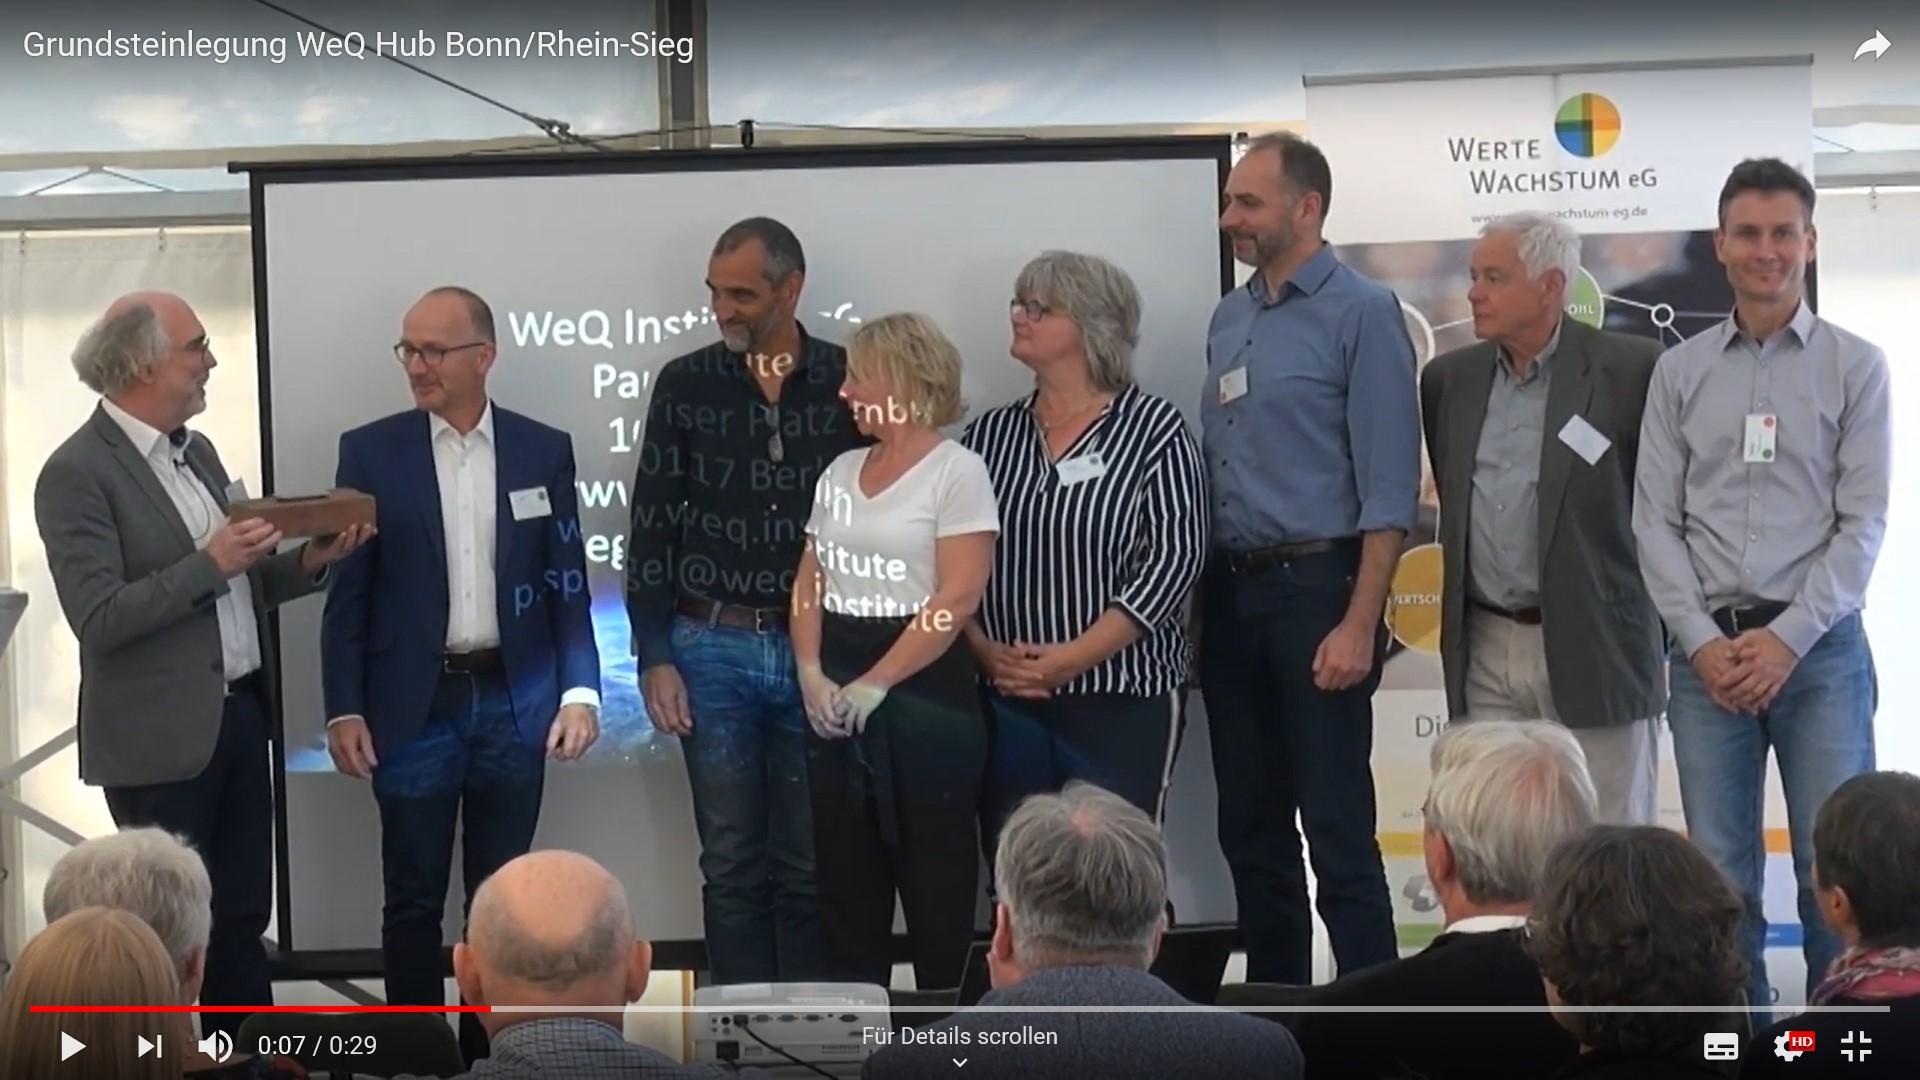 Grundsteinlegung WeQ Hub Bonn/Rhein-Sieg